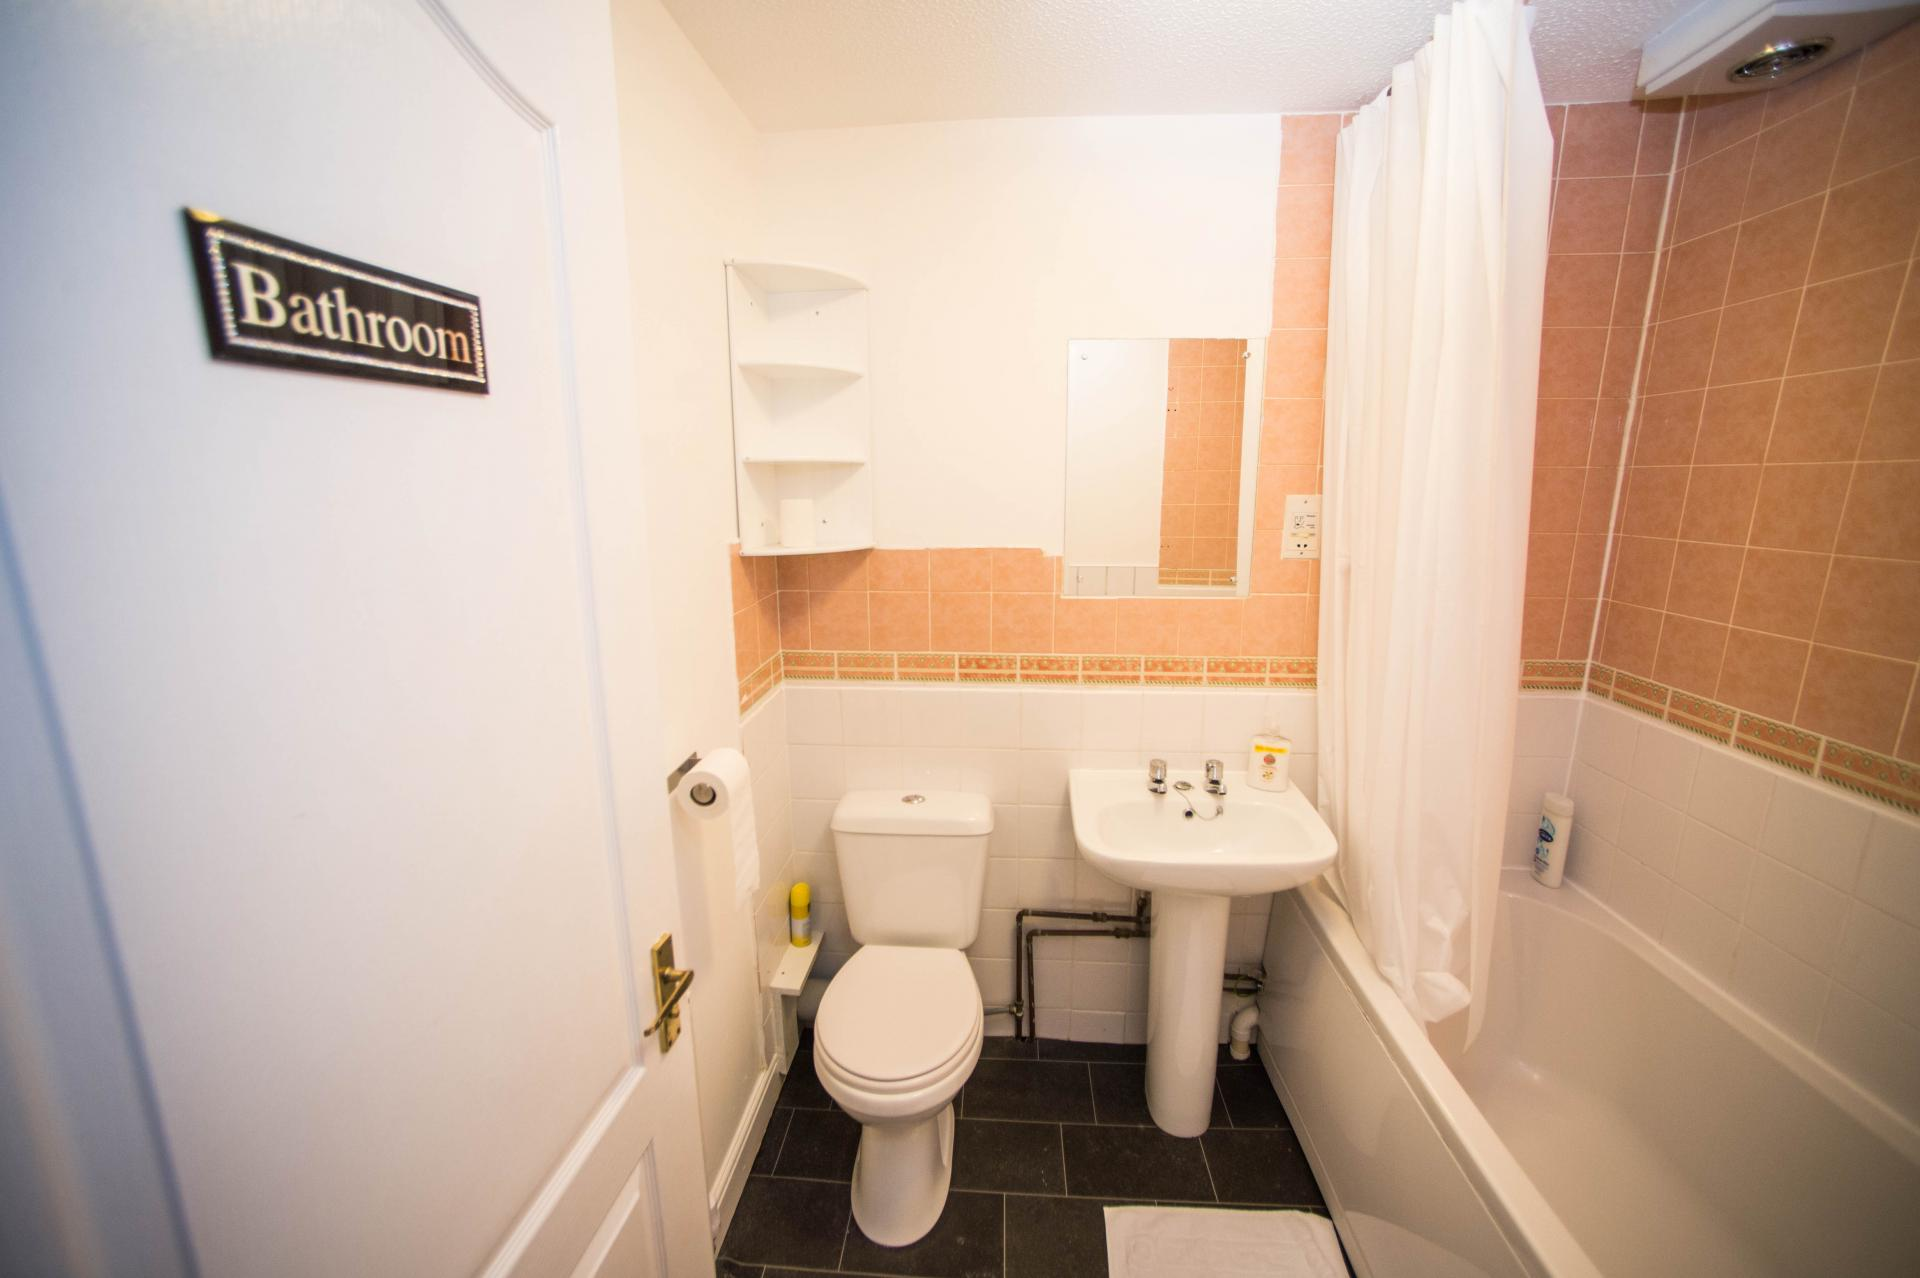 Bathroom at Glasgow Finnieston Apartment, Finnieston, Glasgow - Citybase Apartments